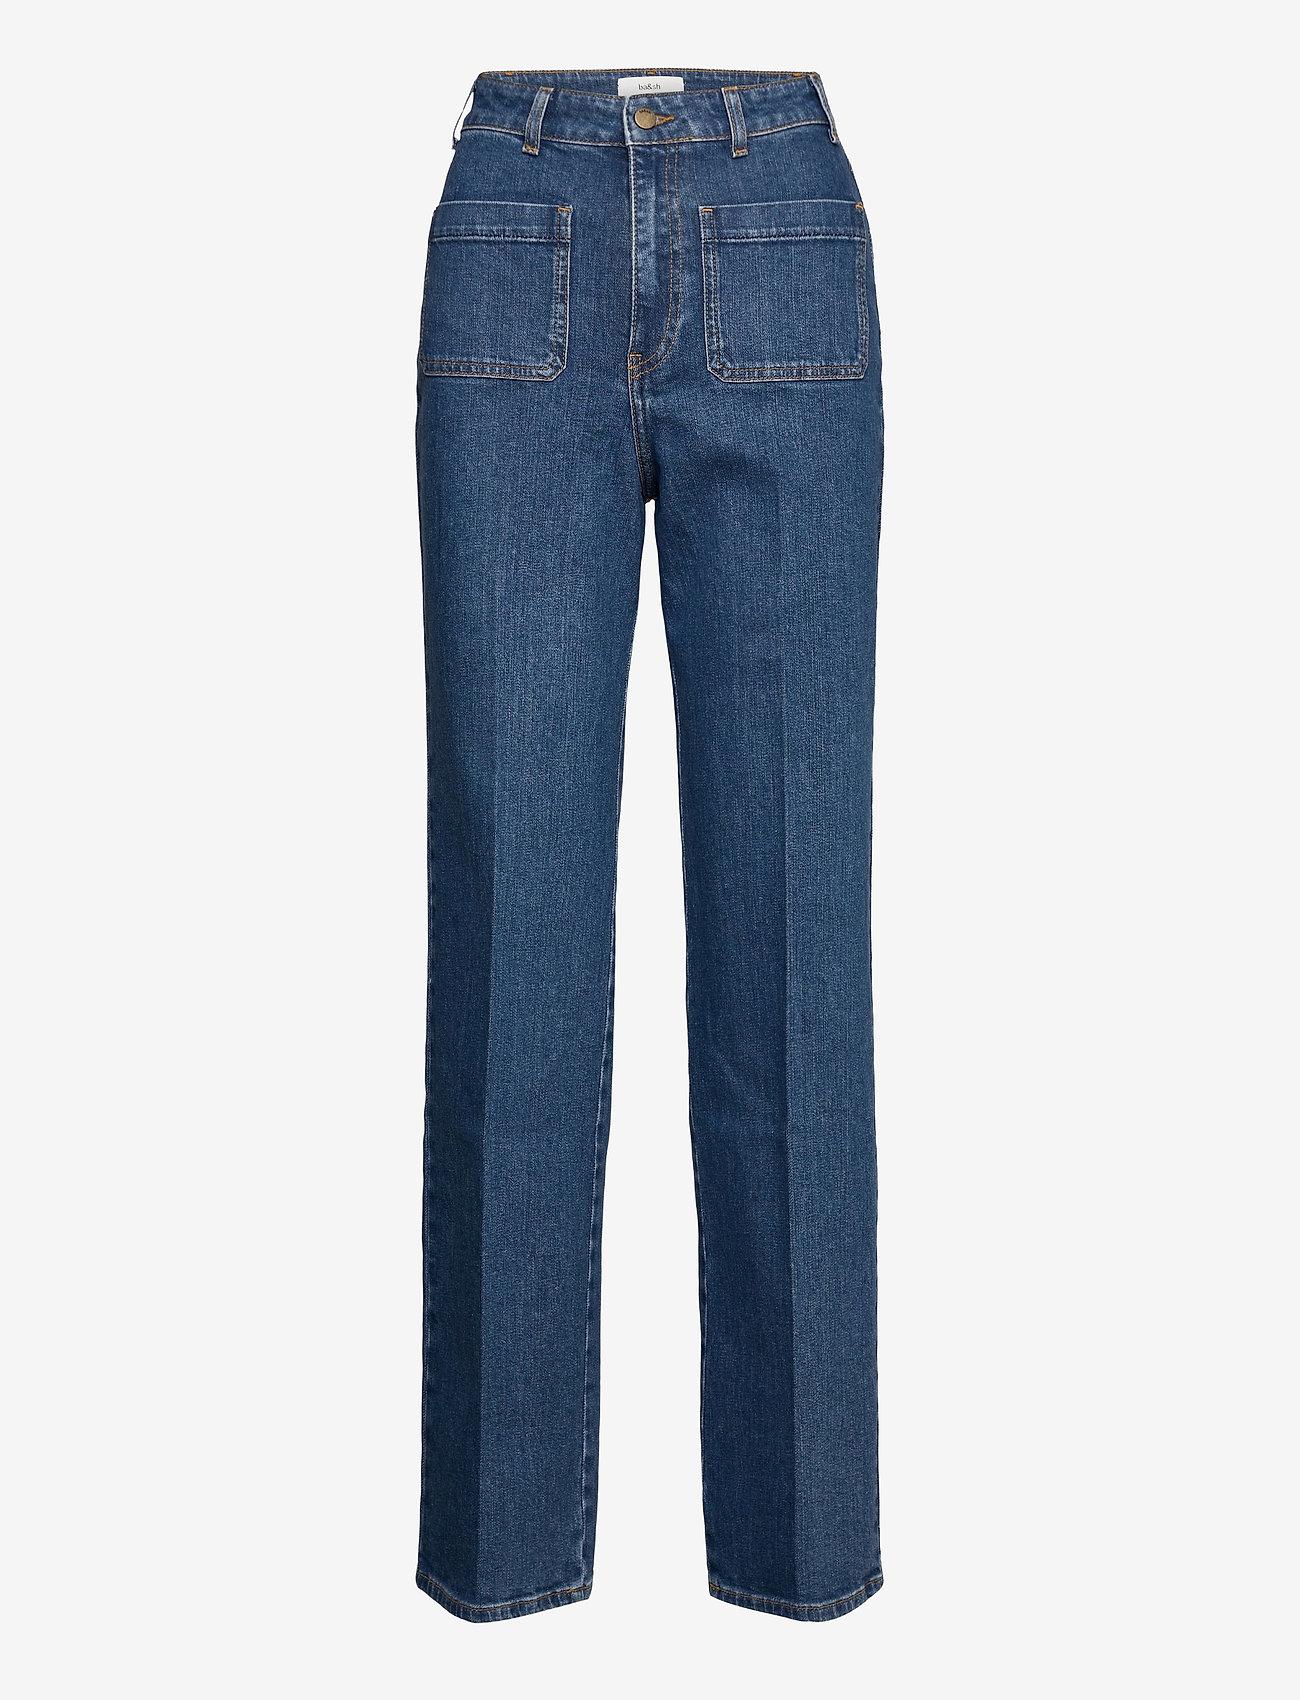 ba&sh - JEANS DJANGO - straight jeans - bluejeans - 0